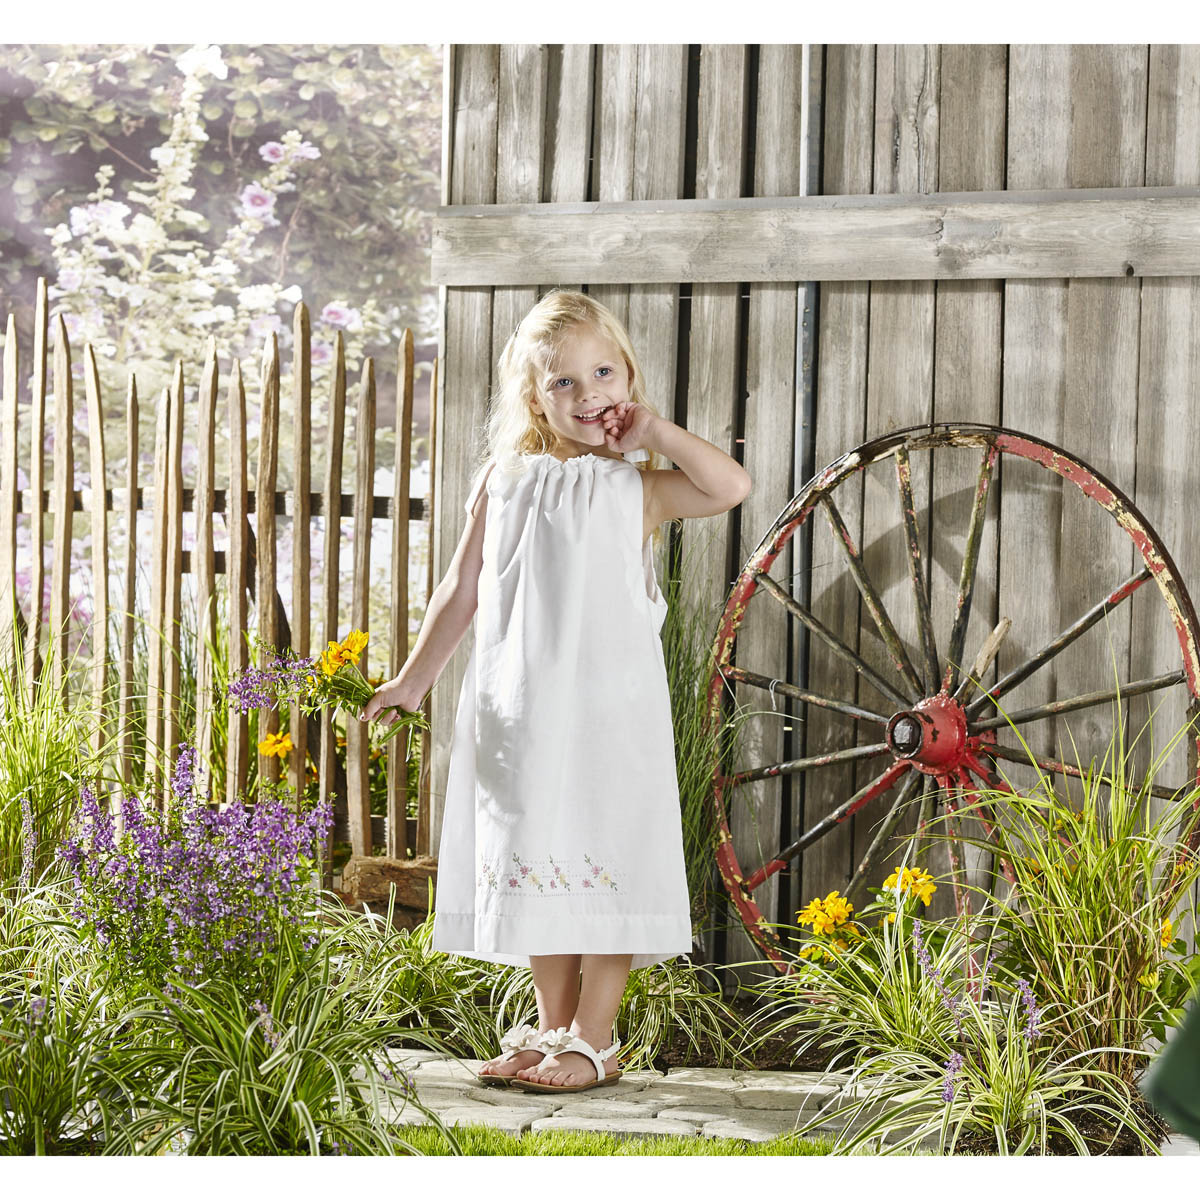 Bucilla ® Stamped Cross Stitch & Embroidery - Pillowcase Dress - Pretty Posies